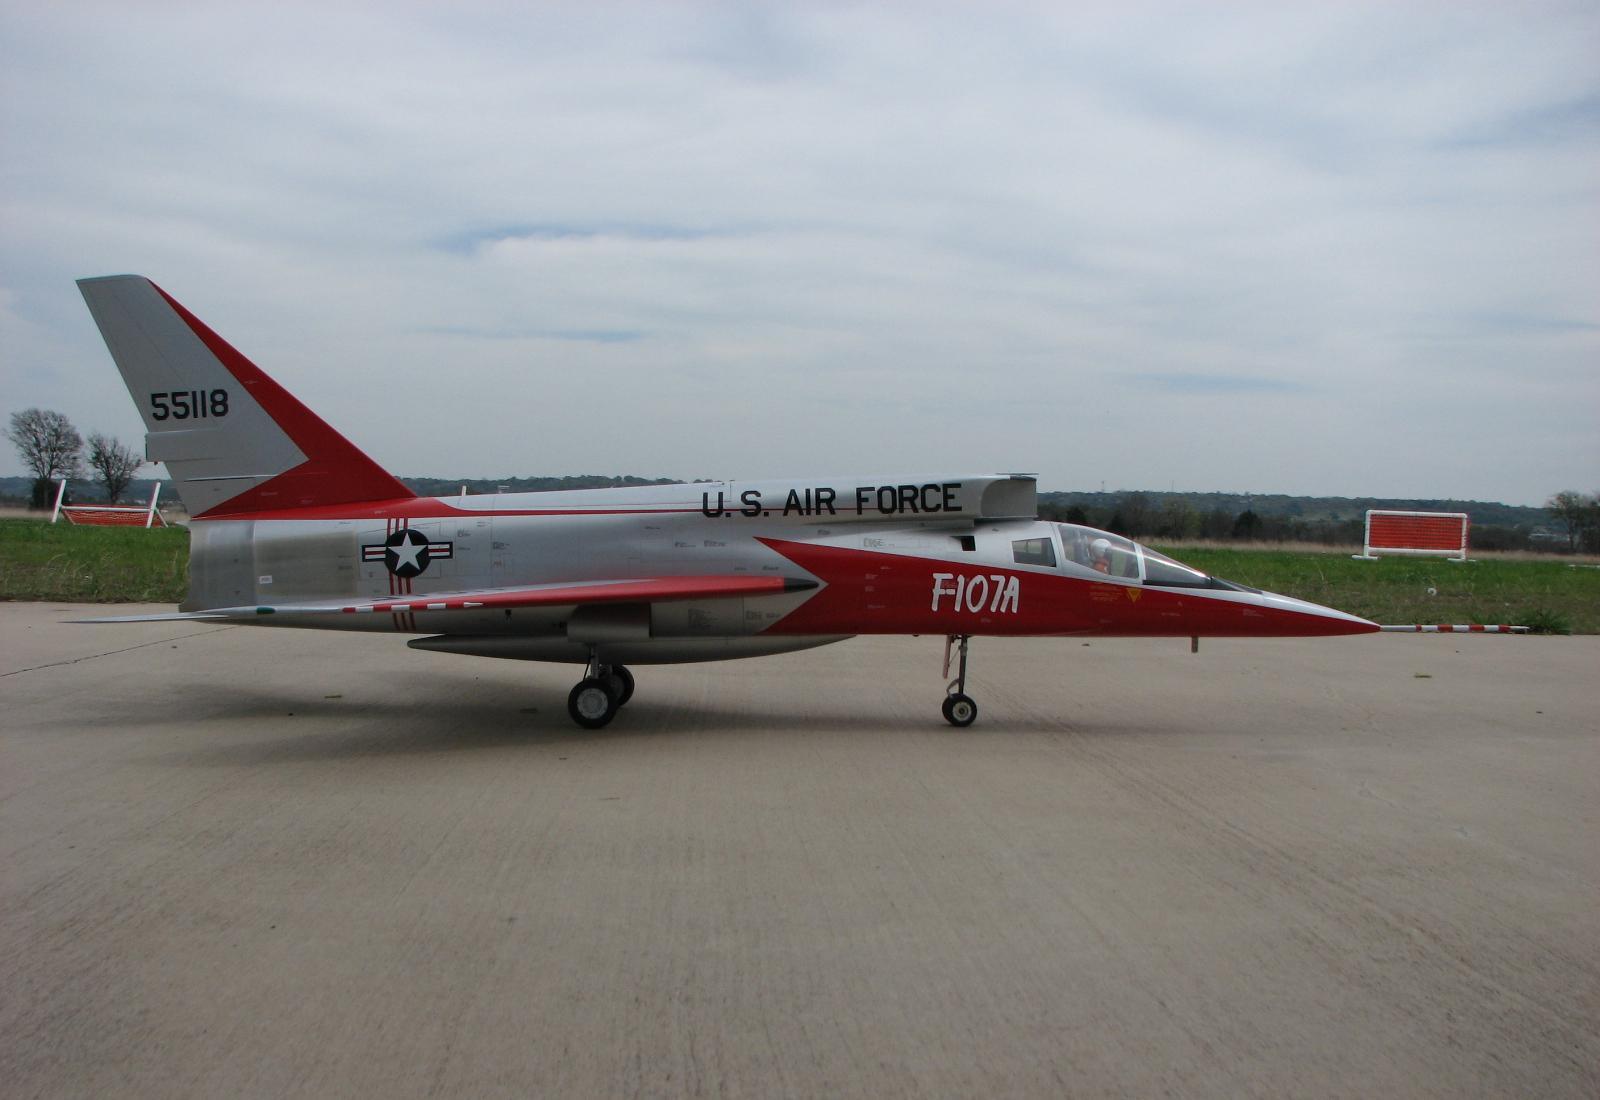 H:\مقالات هوانوردی\F-107A\IMG_0307small.JPG